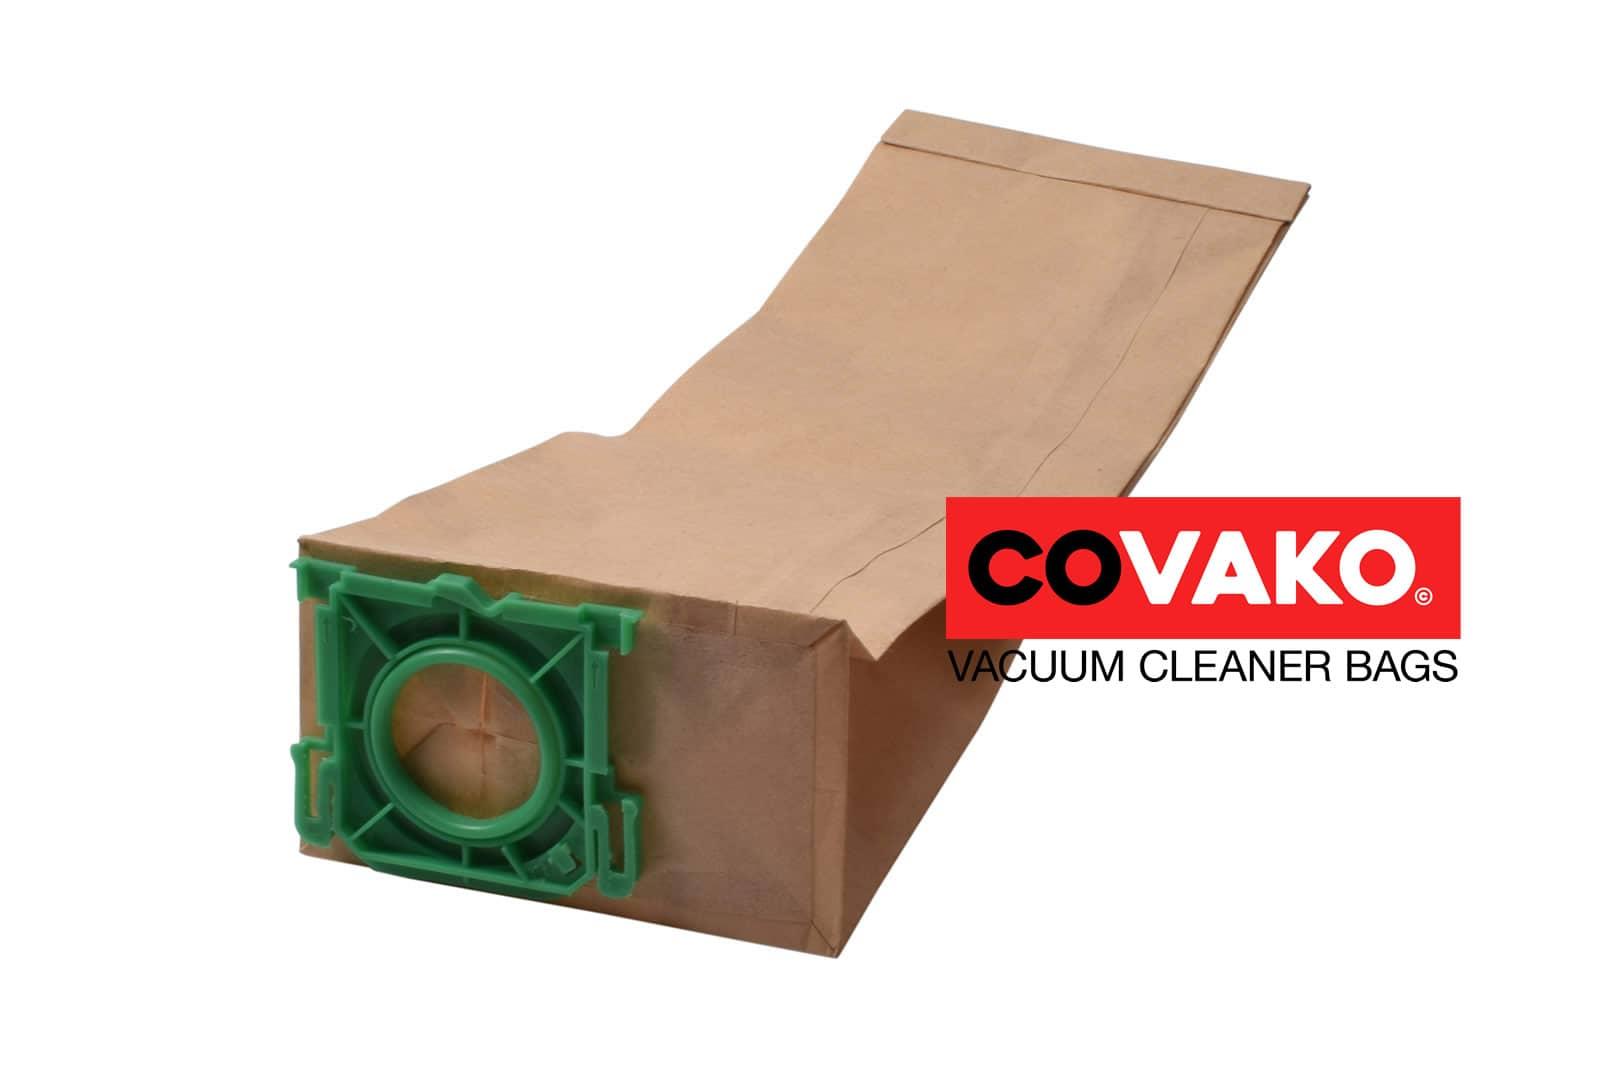 Sorma TM 370 / Papier - Sorma sacs d'aspirateur